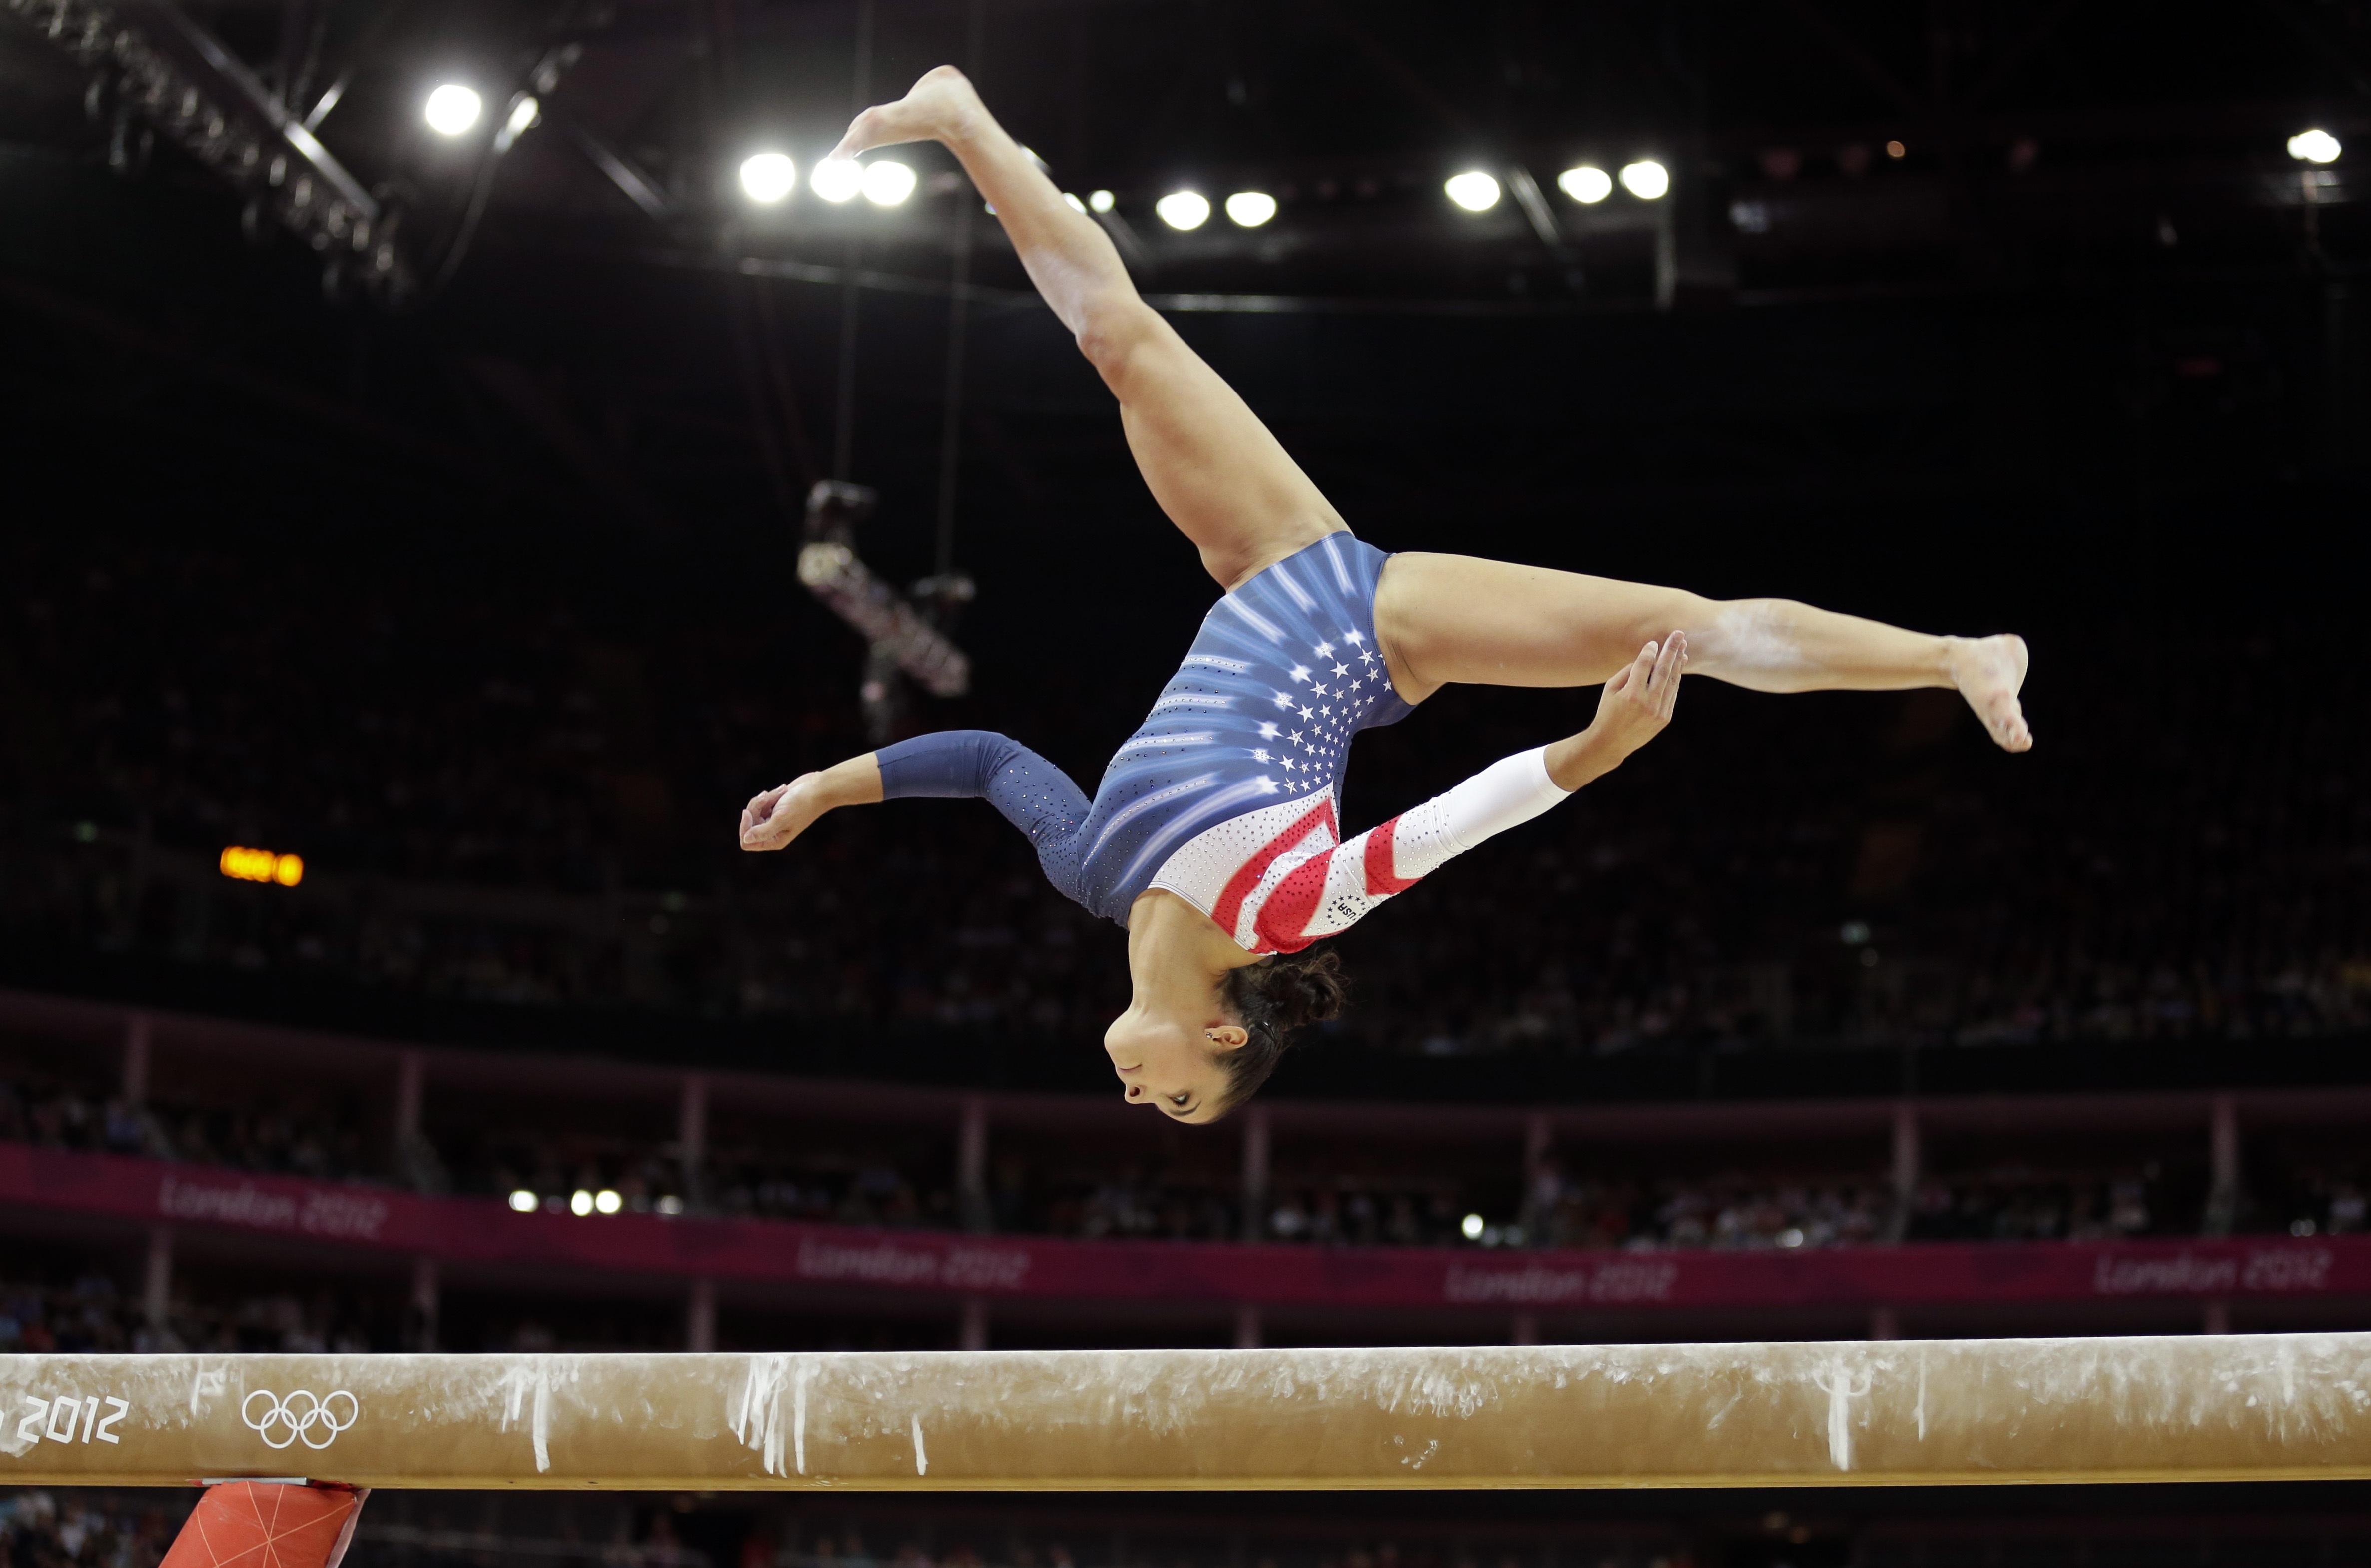 Olympic Gymnast Aly Raisman on Health and Wellness